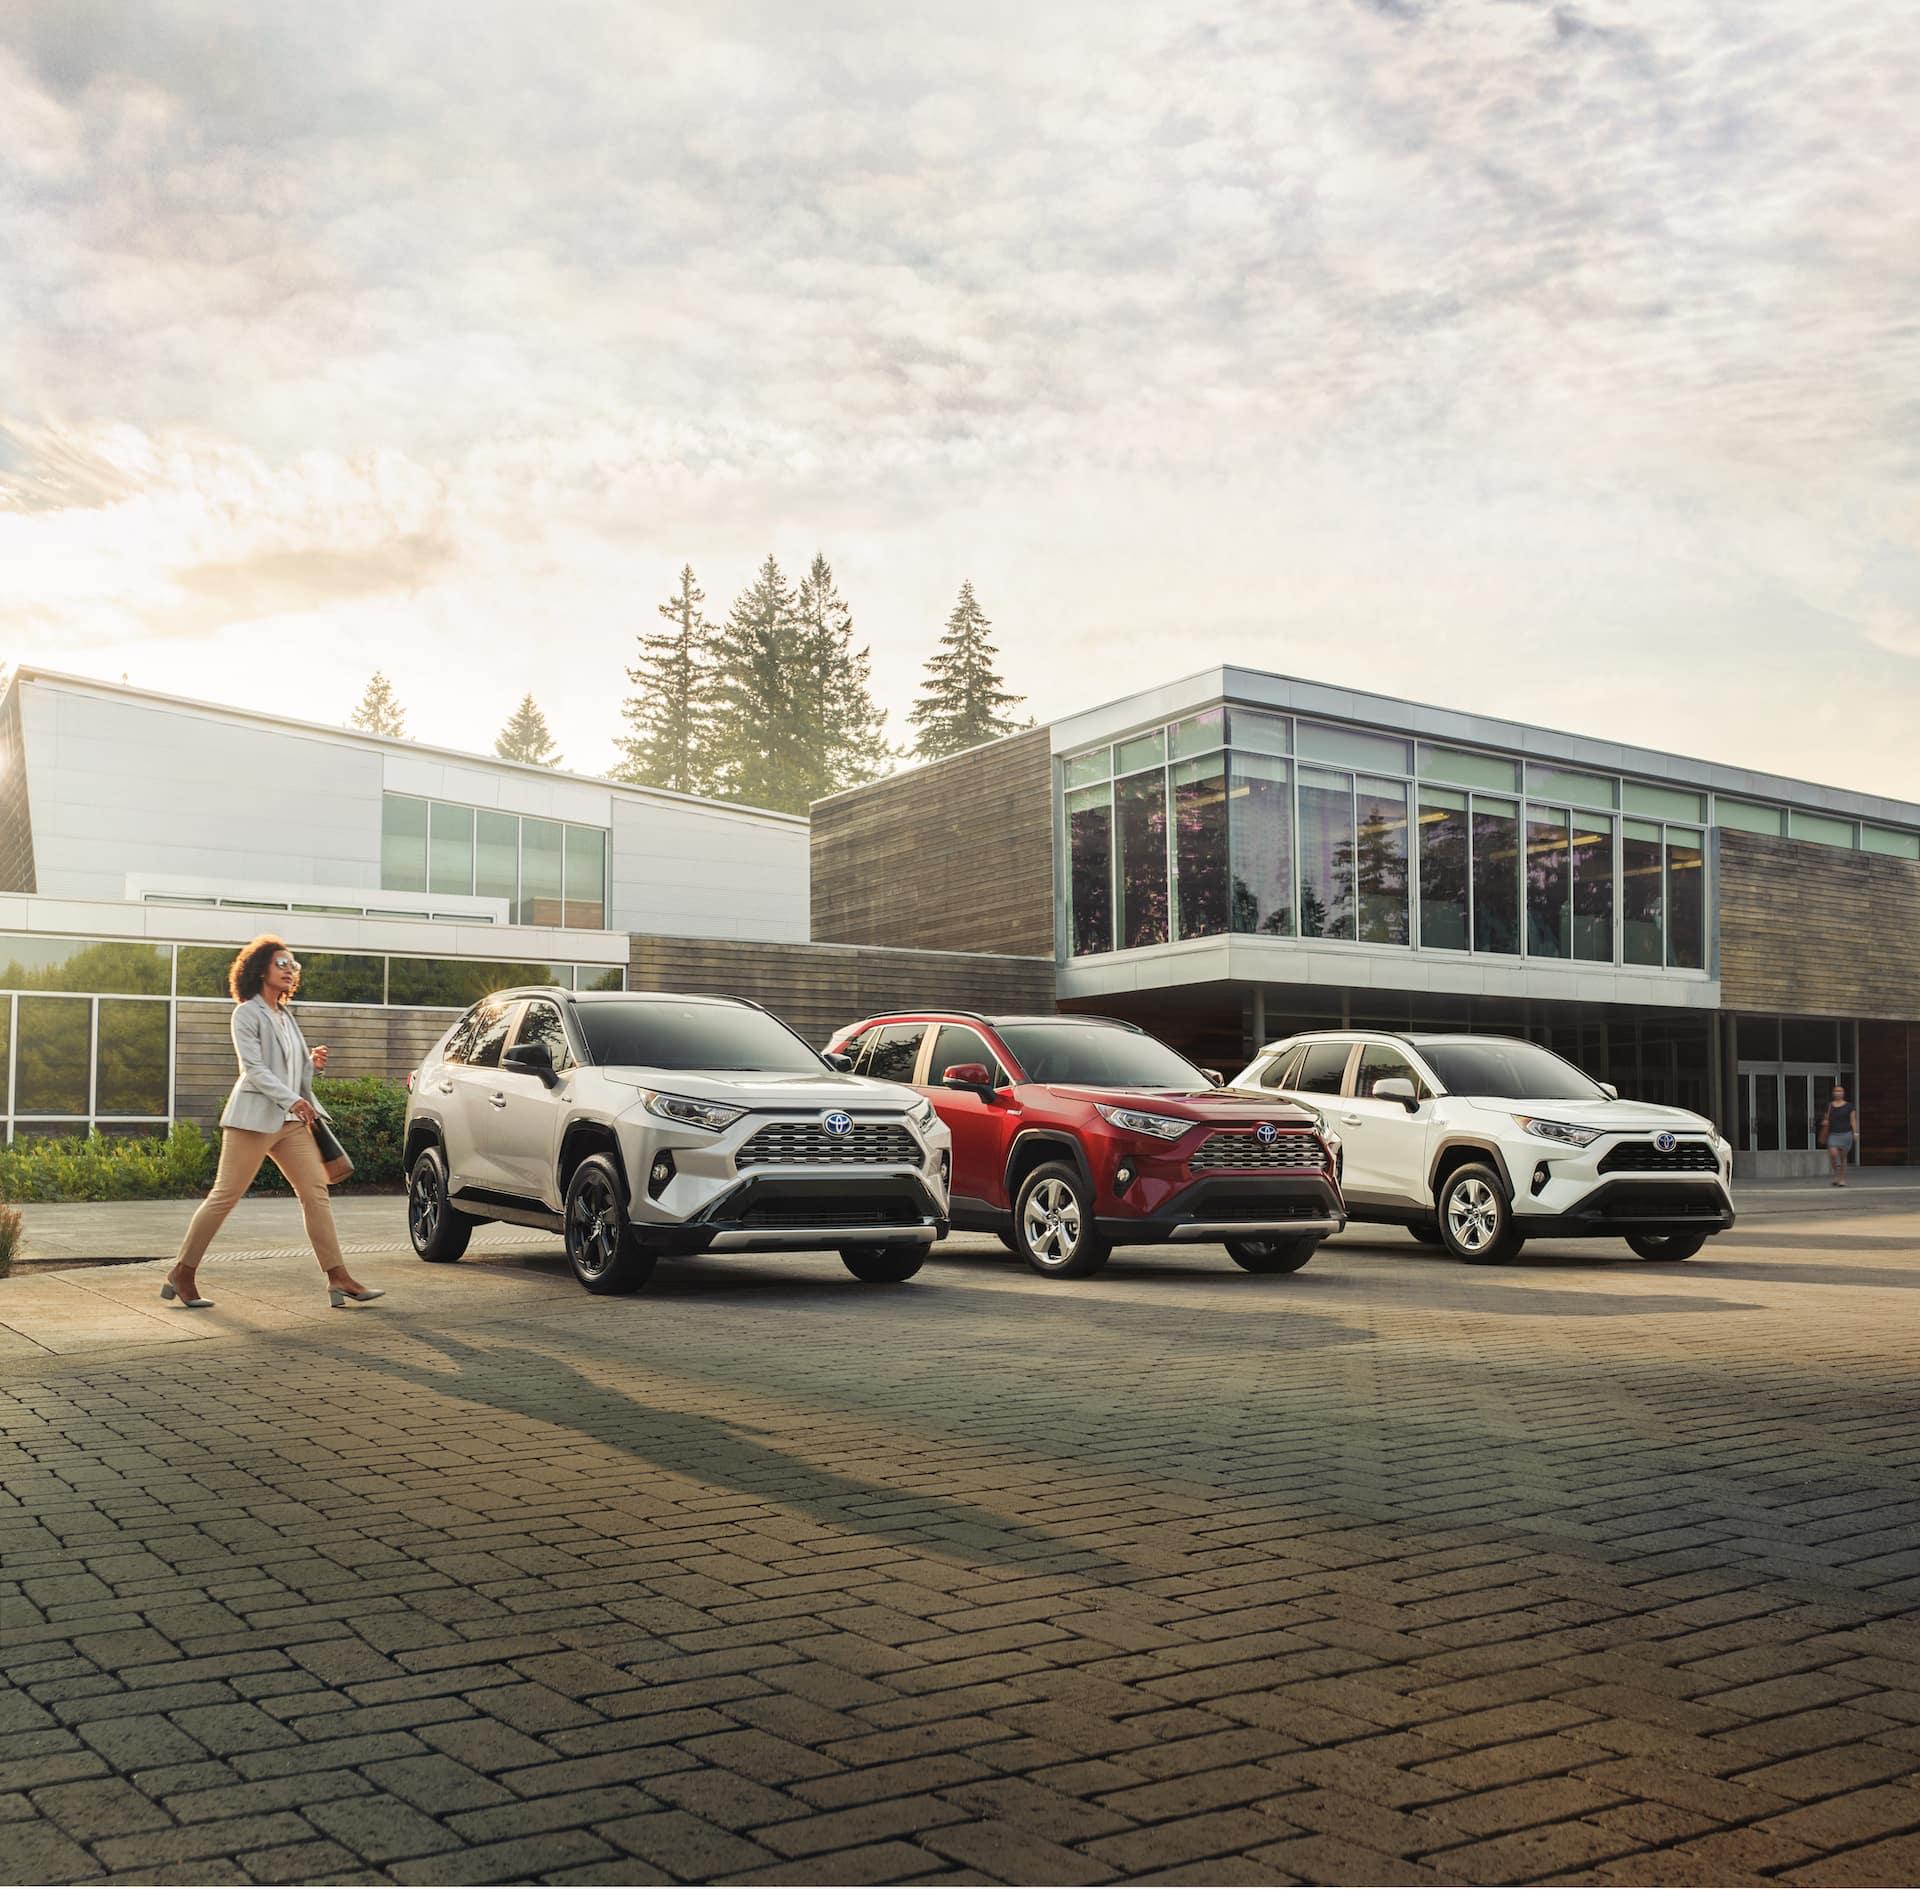 Halterman's Toyota is a Toyota Dealership near Hackettstown, PA | Three 2021 Toyota RAV4s parked in a row